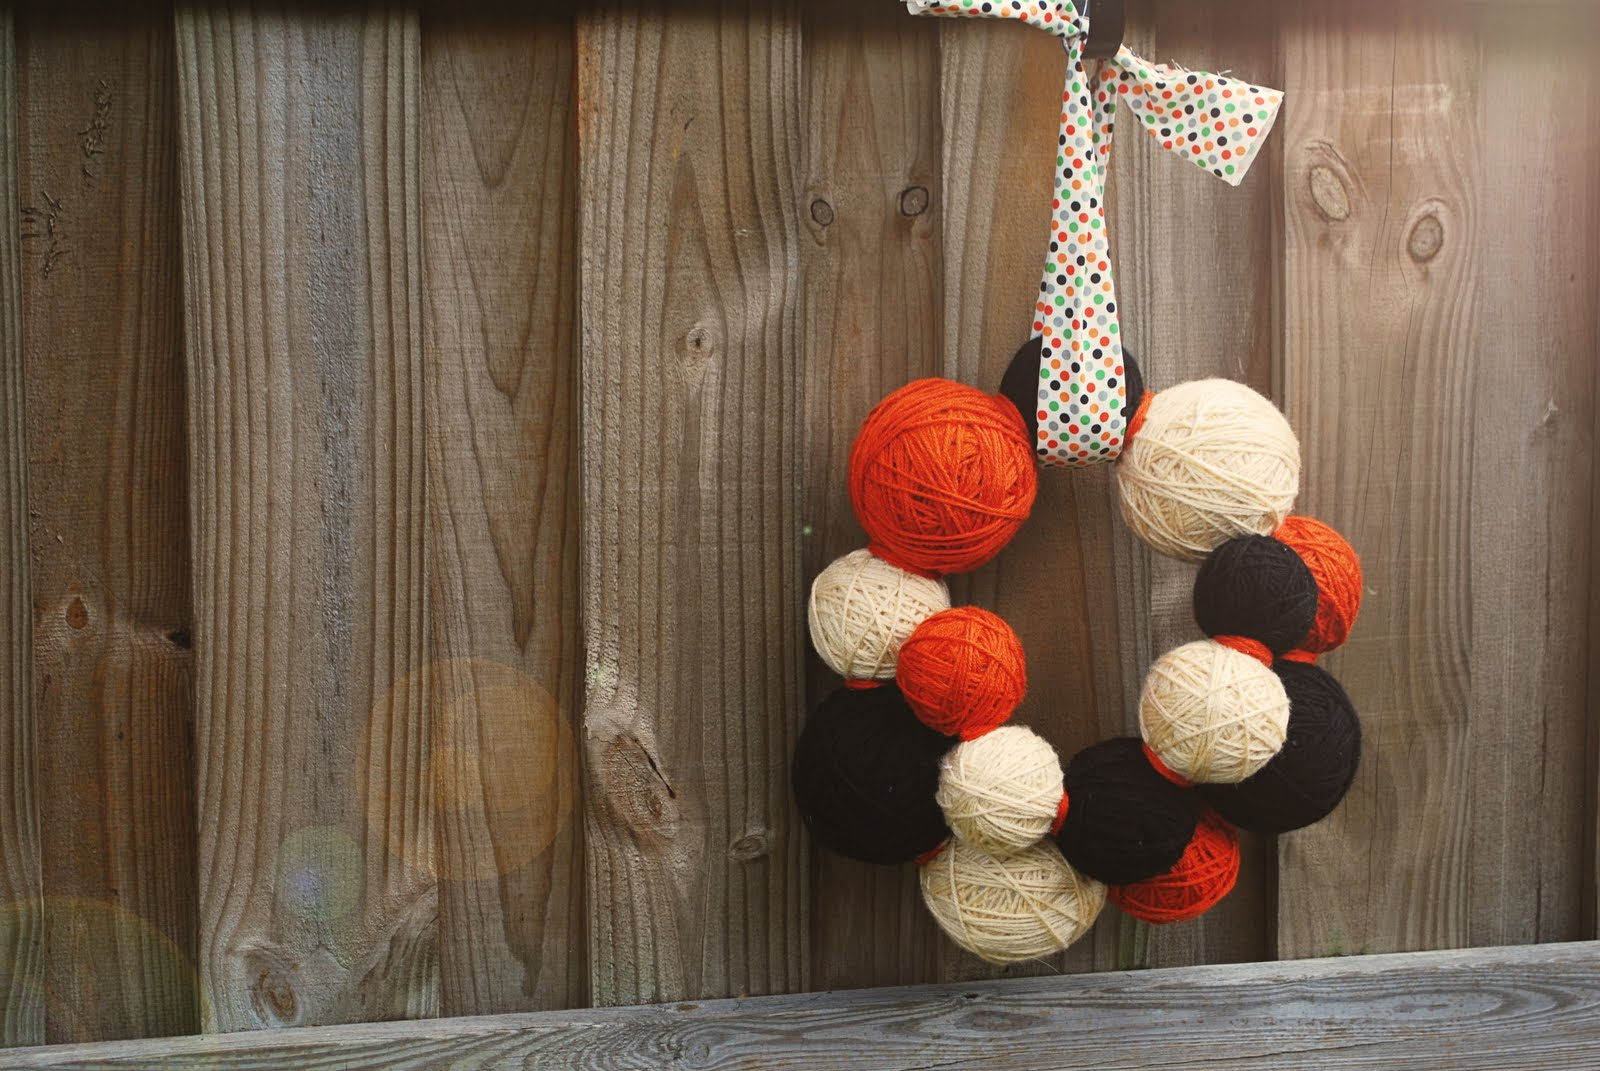 http://1.bp.blogspot.com/_FhqPGZn19dA/THk0arD3LrI/AAAAAAAAMpQ/LkXQQudkVe0/s1600/Halloween+Yarn+Wreath+009+copy.jpg